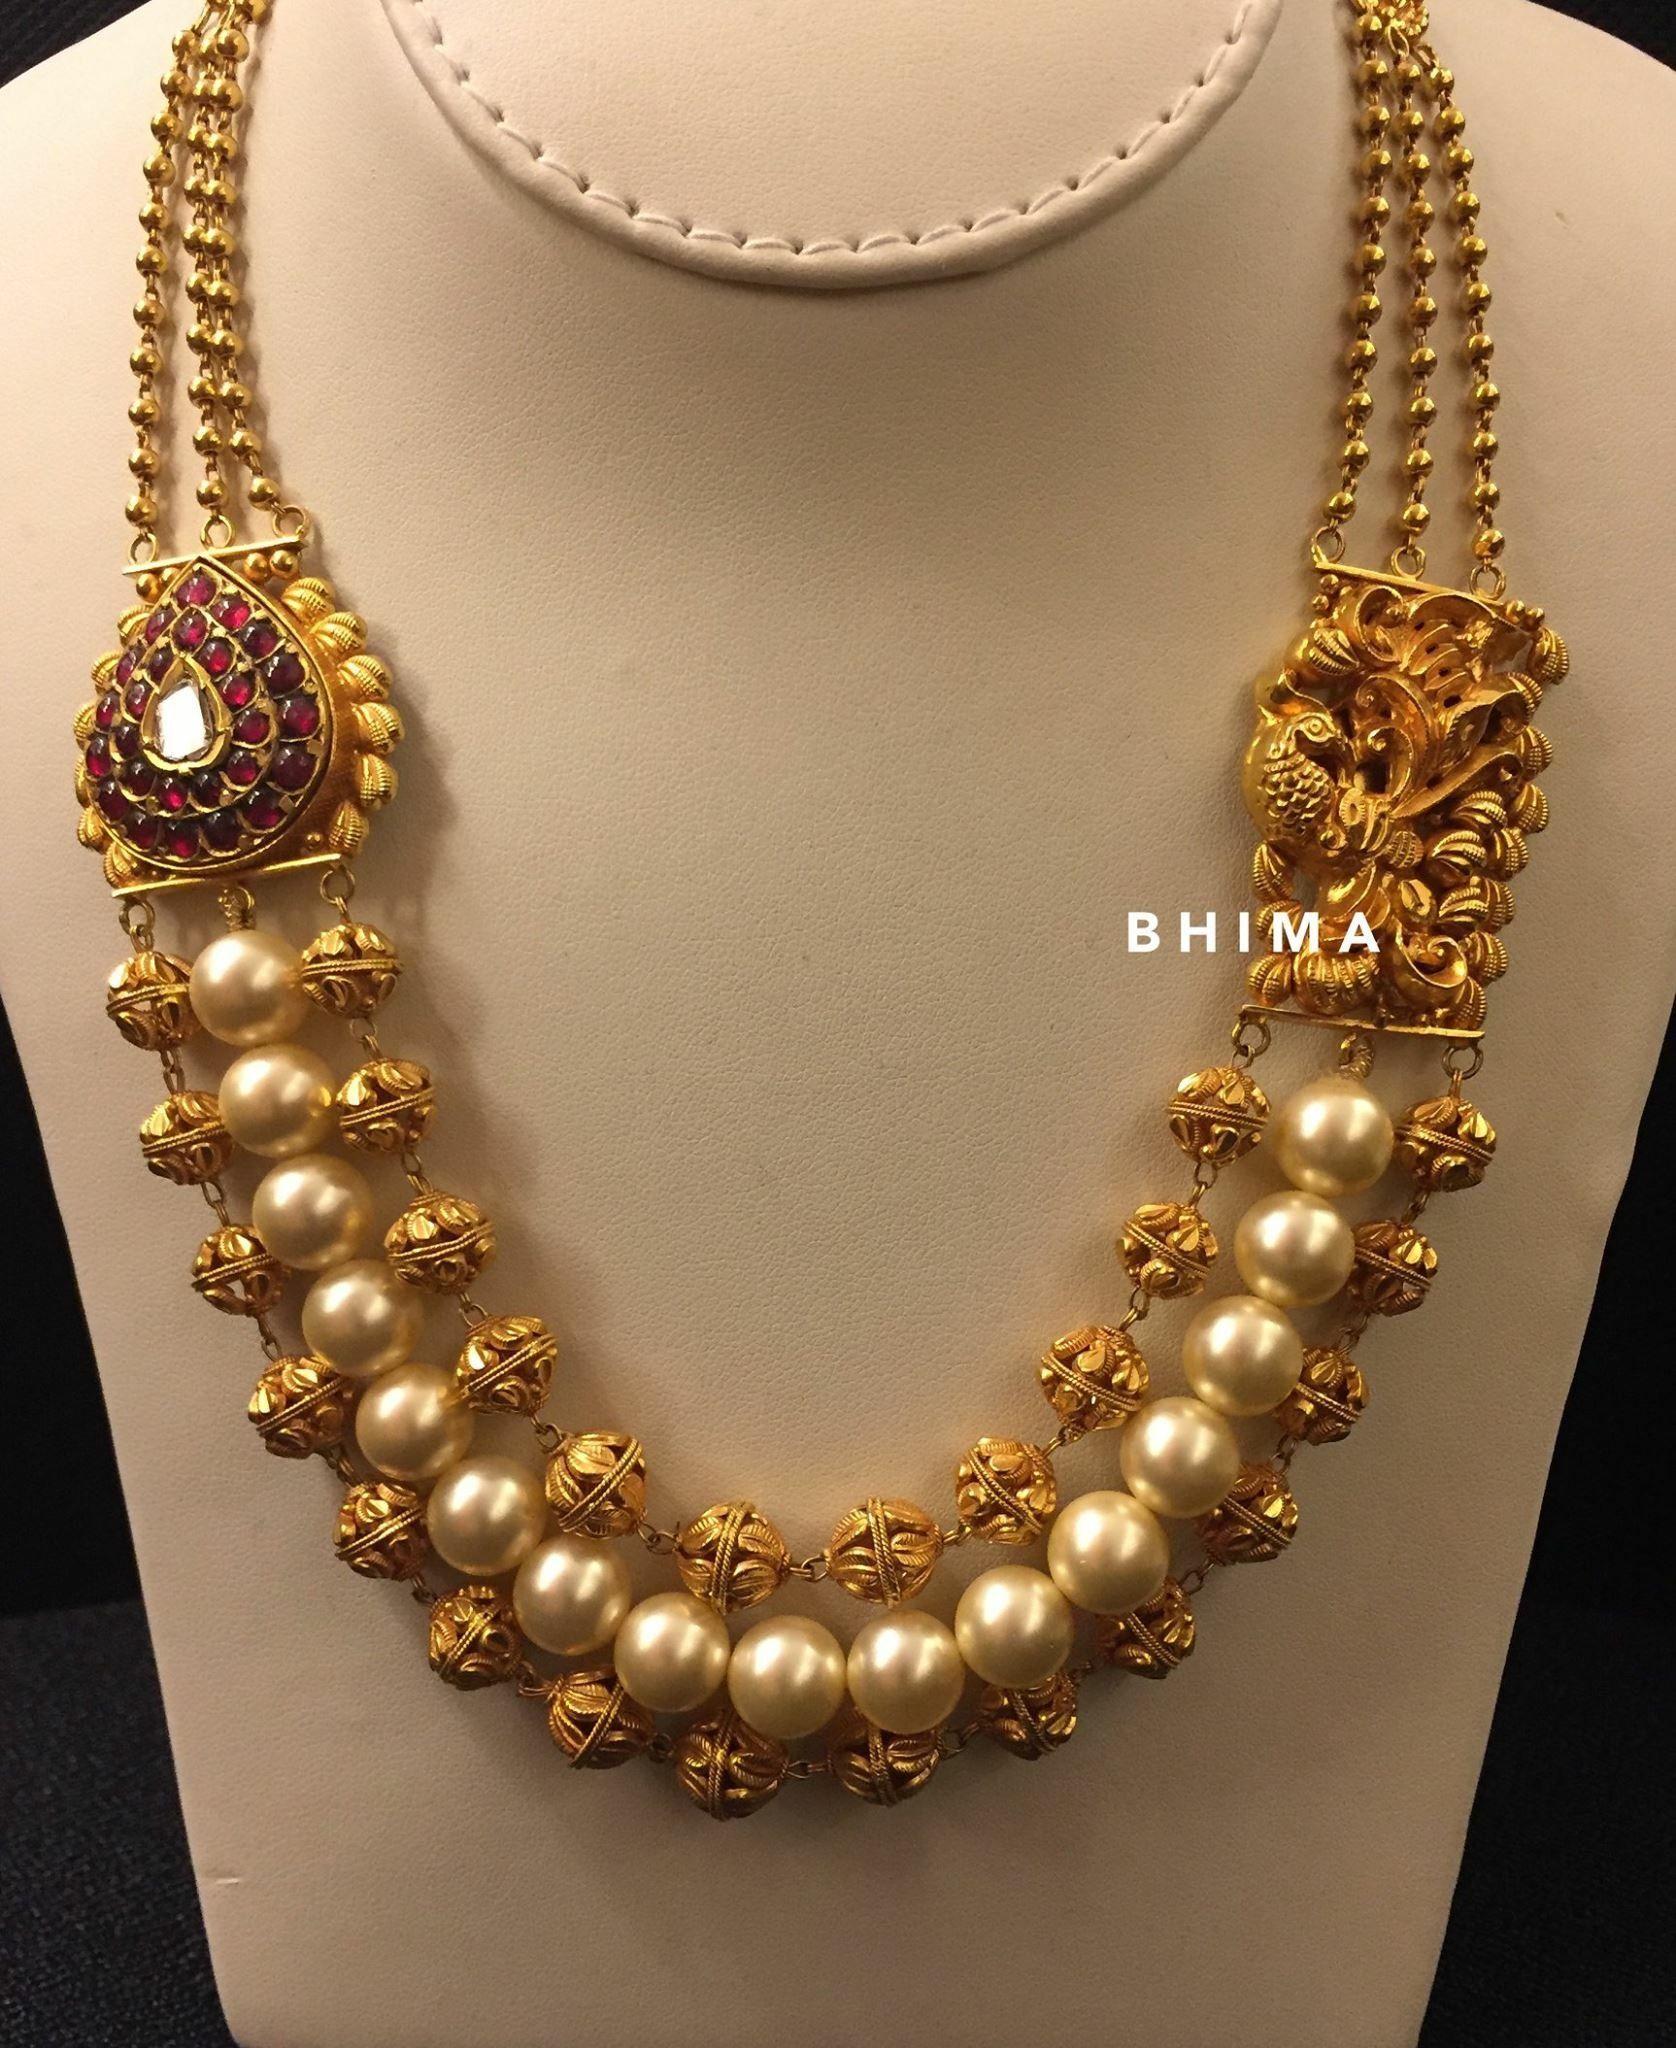 Indian jewelry goldjewellerydesignbridal gold jewellery design